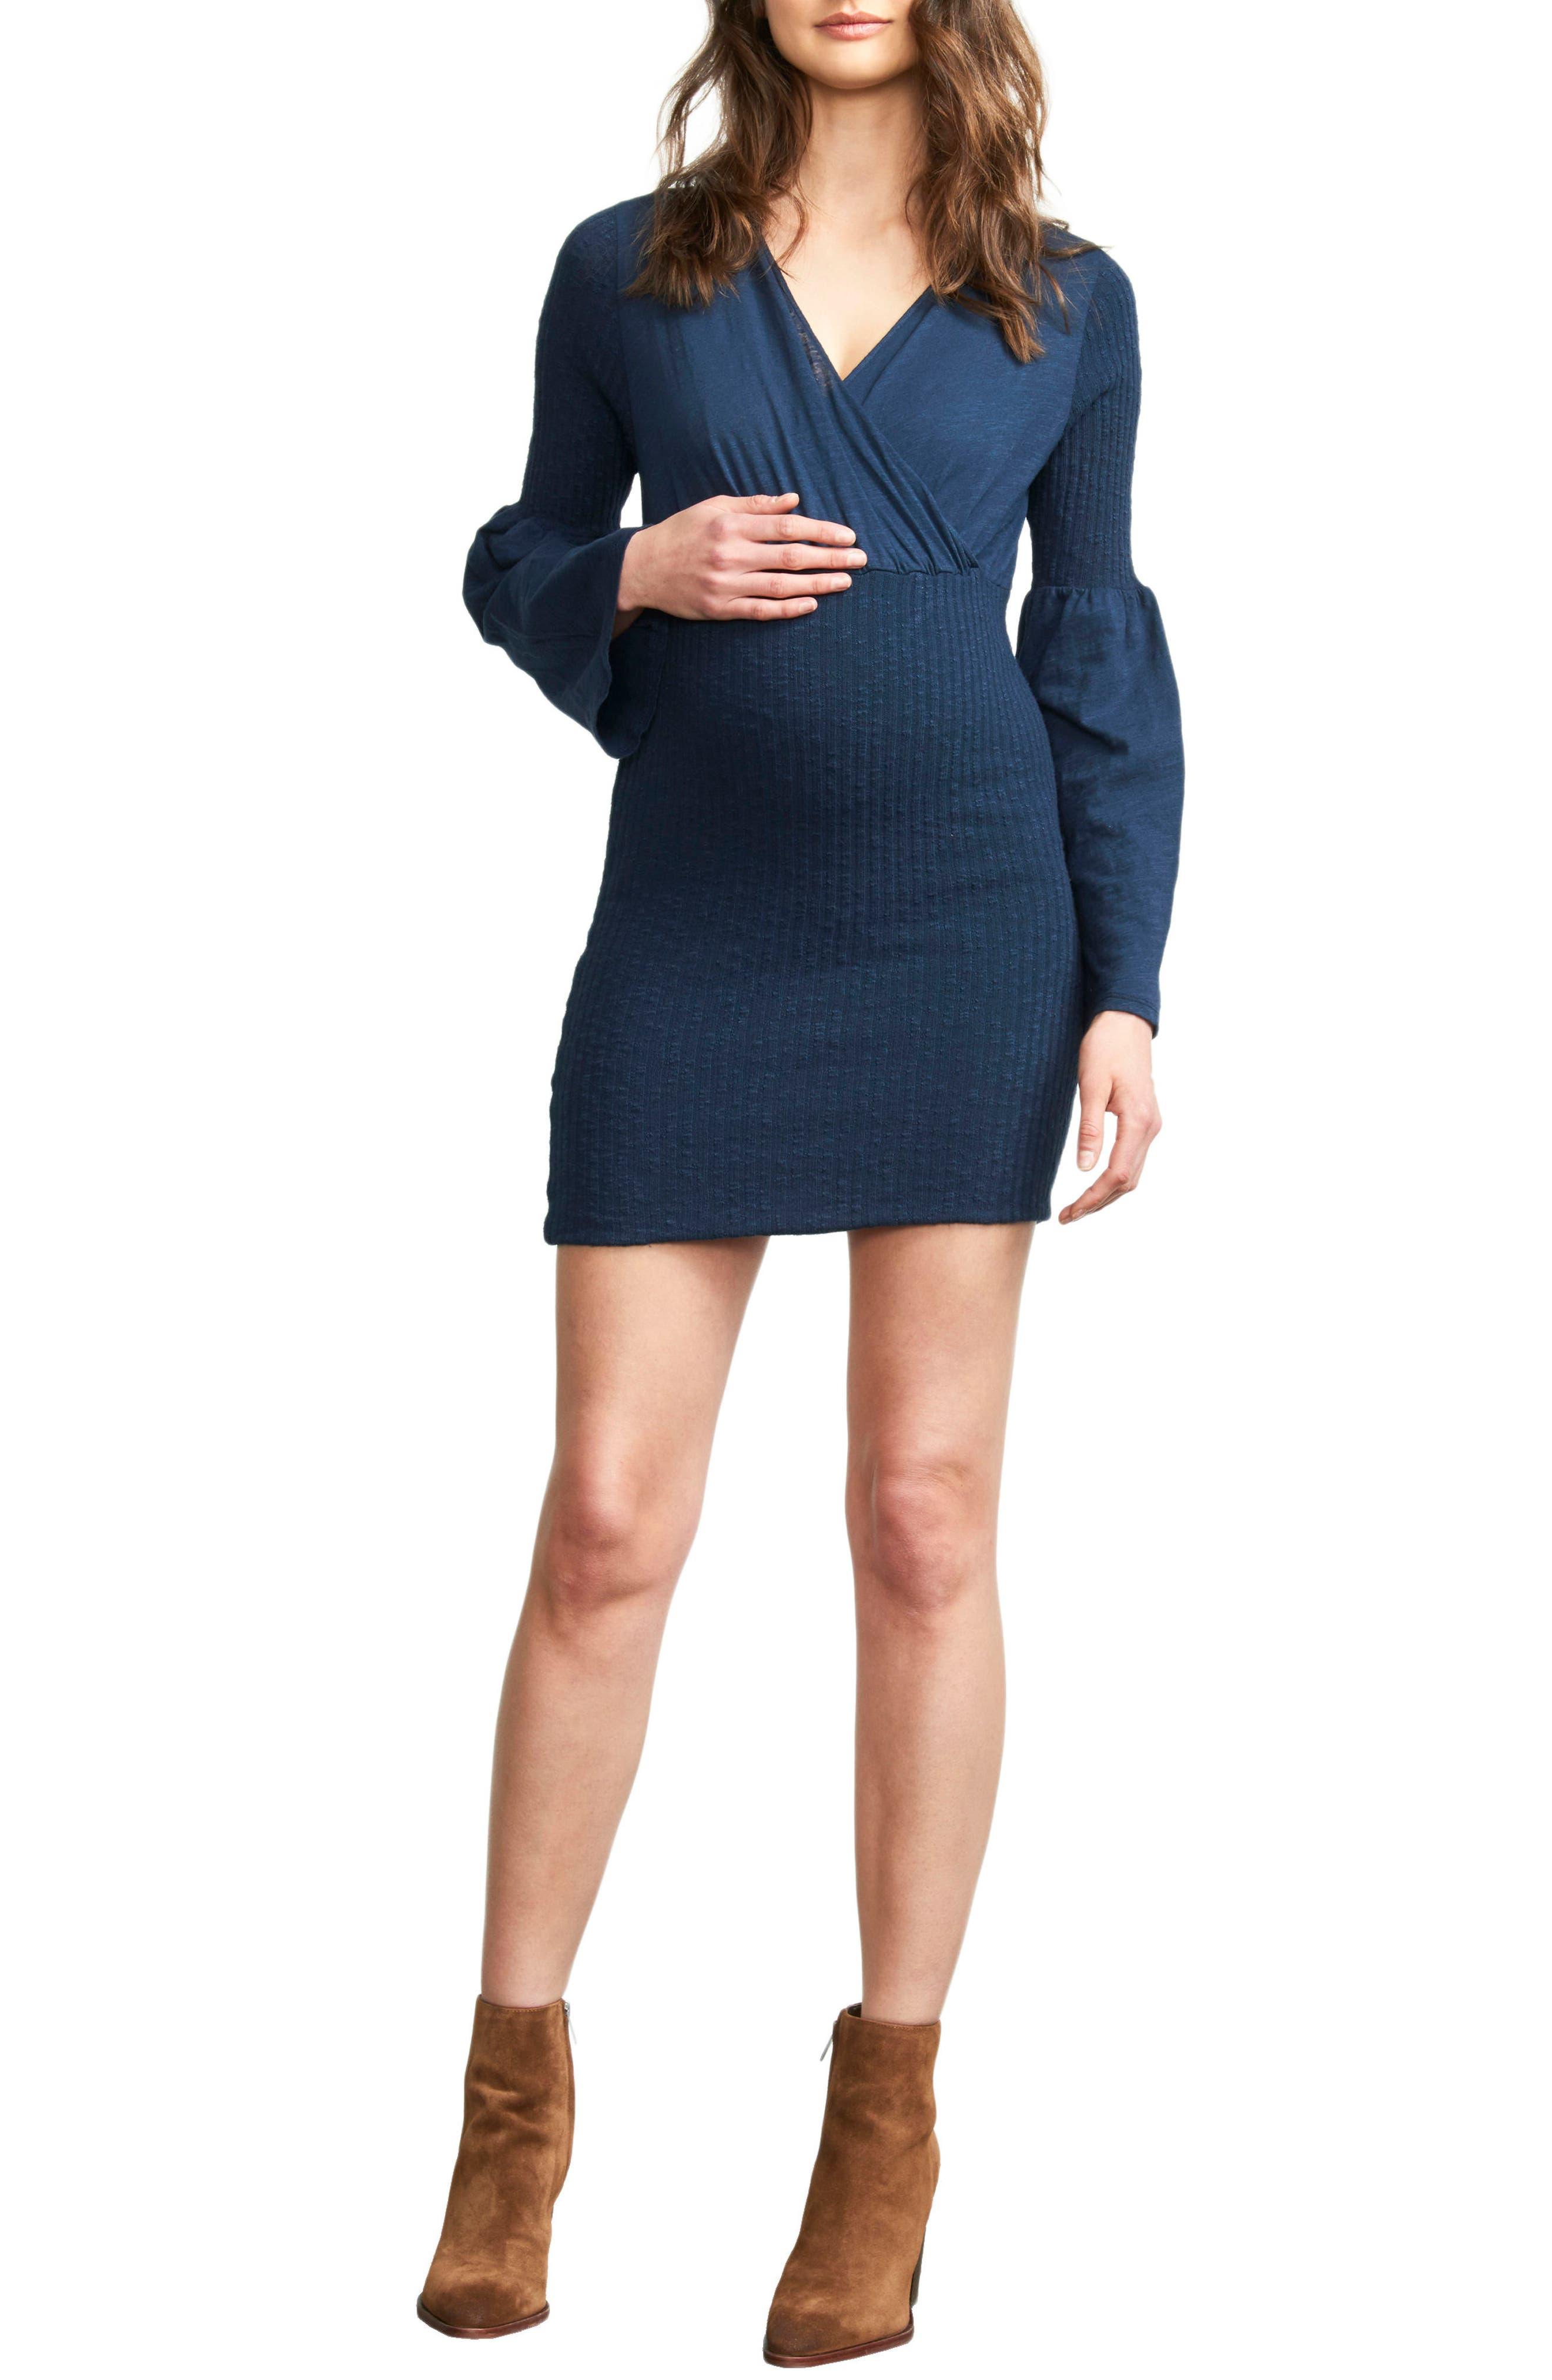 MATERNAL AMERICA Belly Hug Maternity Dress, Main, color, NAVY